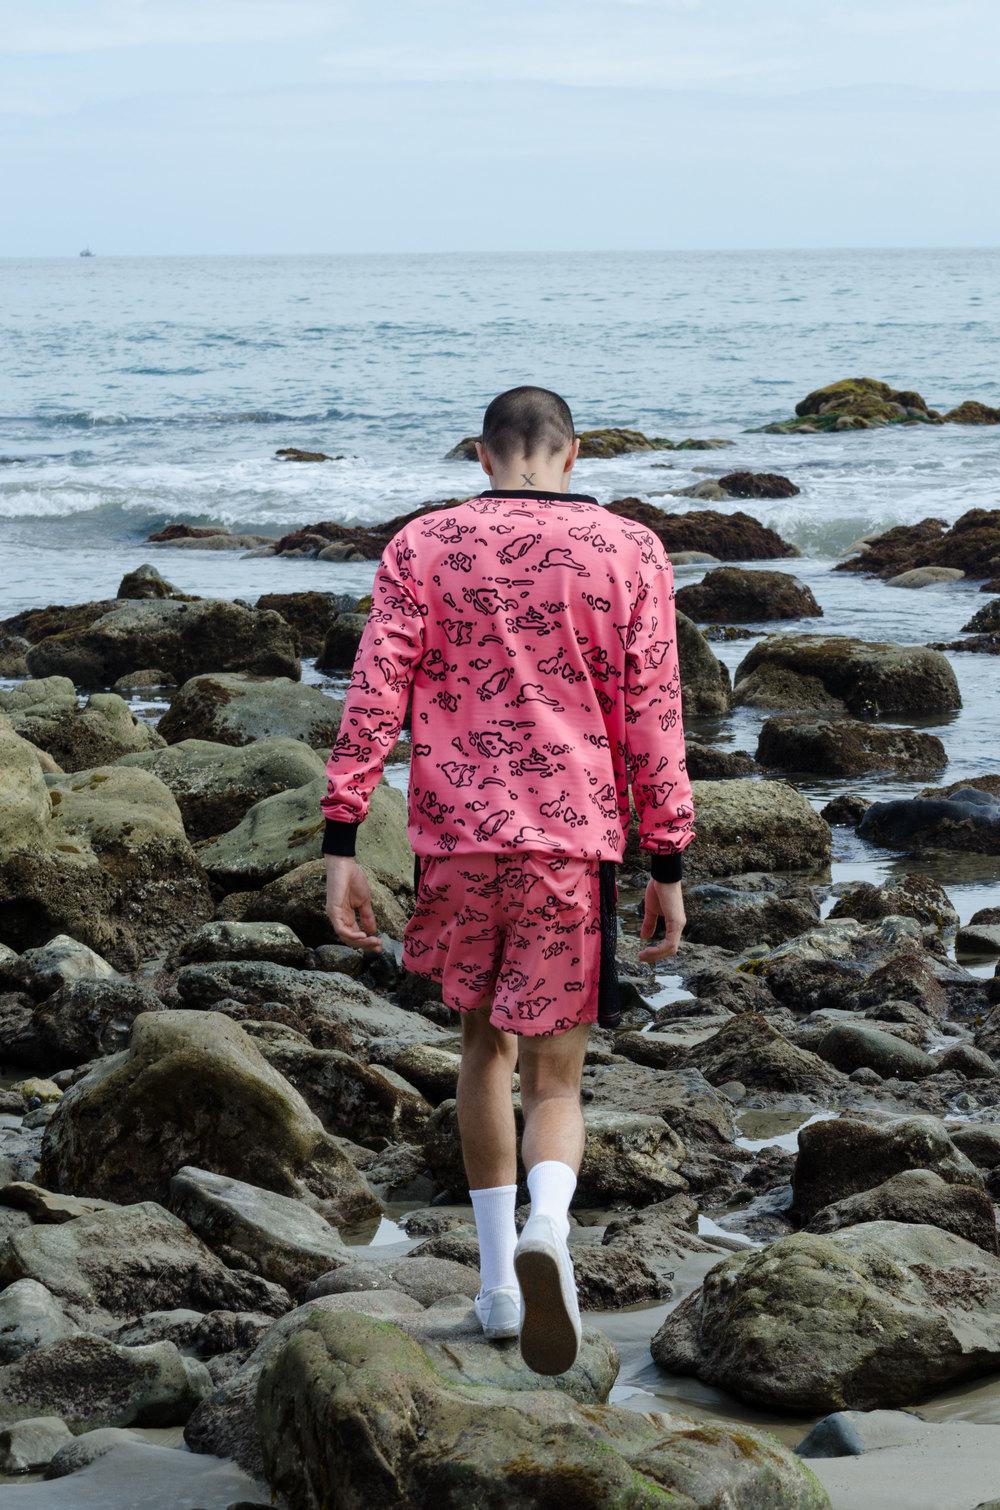 David-Malibu-Pink-SS16-9-casenruiz.jpg